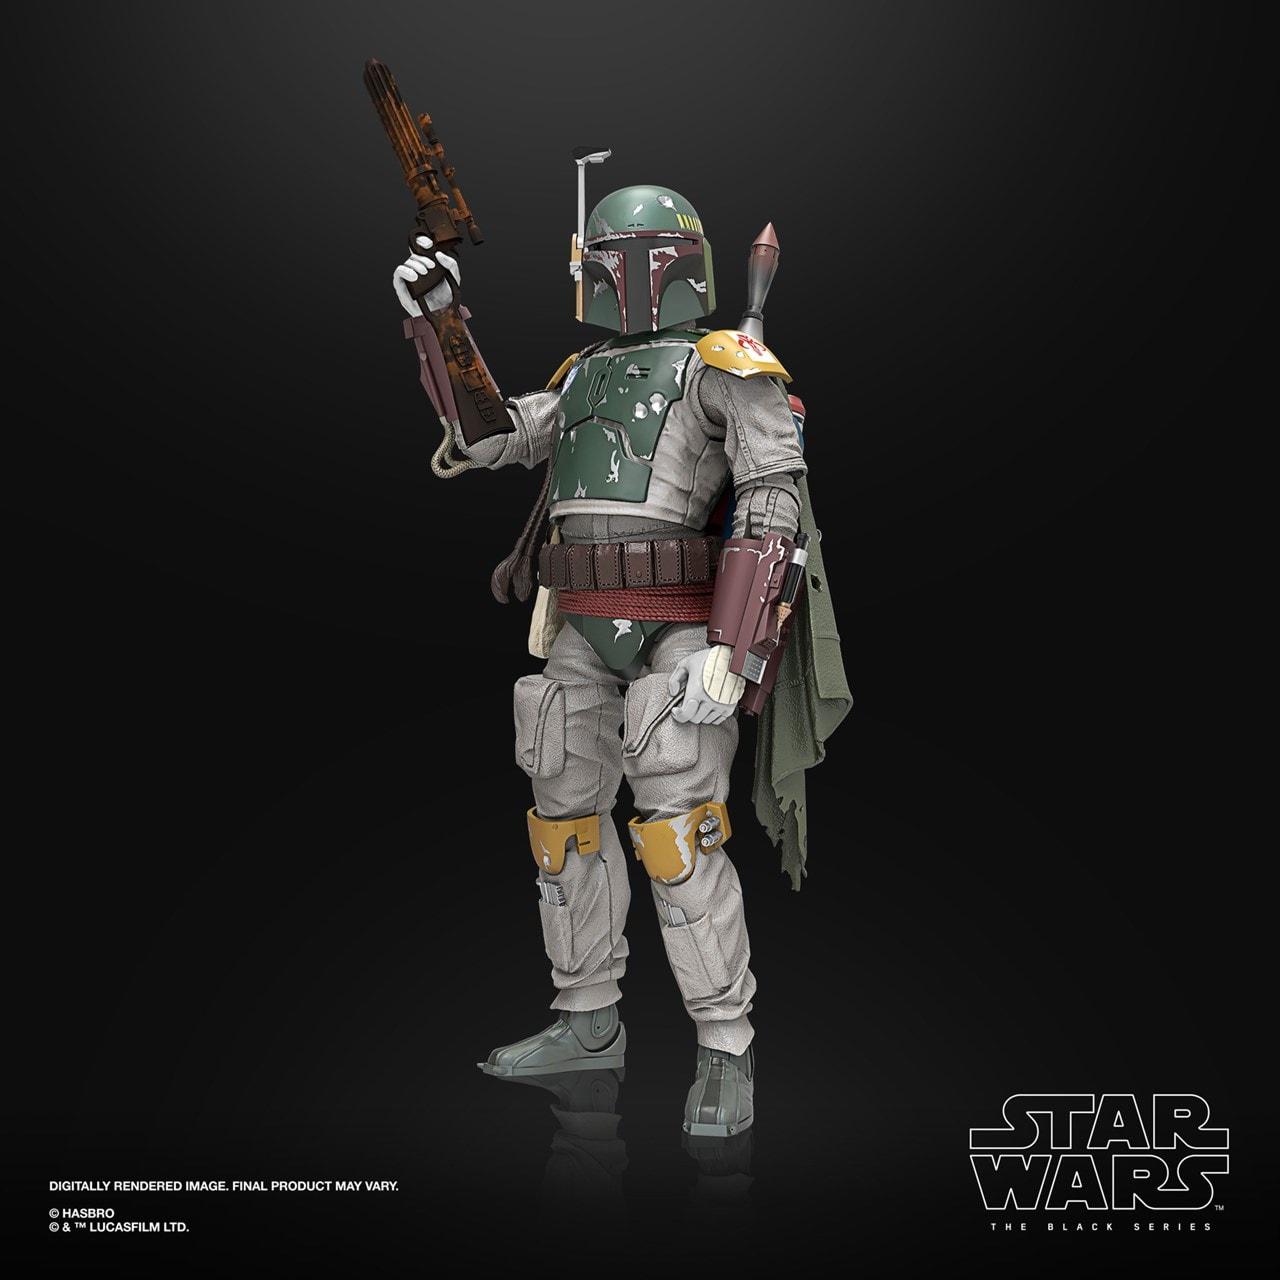 Boba Fett: Deluxe: The Black Series: Star Wars Action Figure - 1